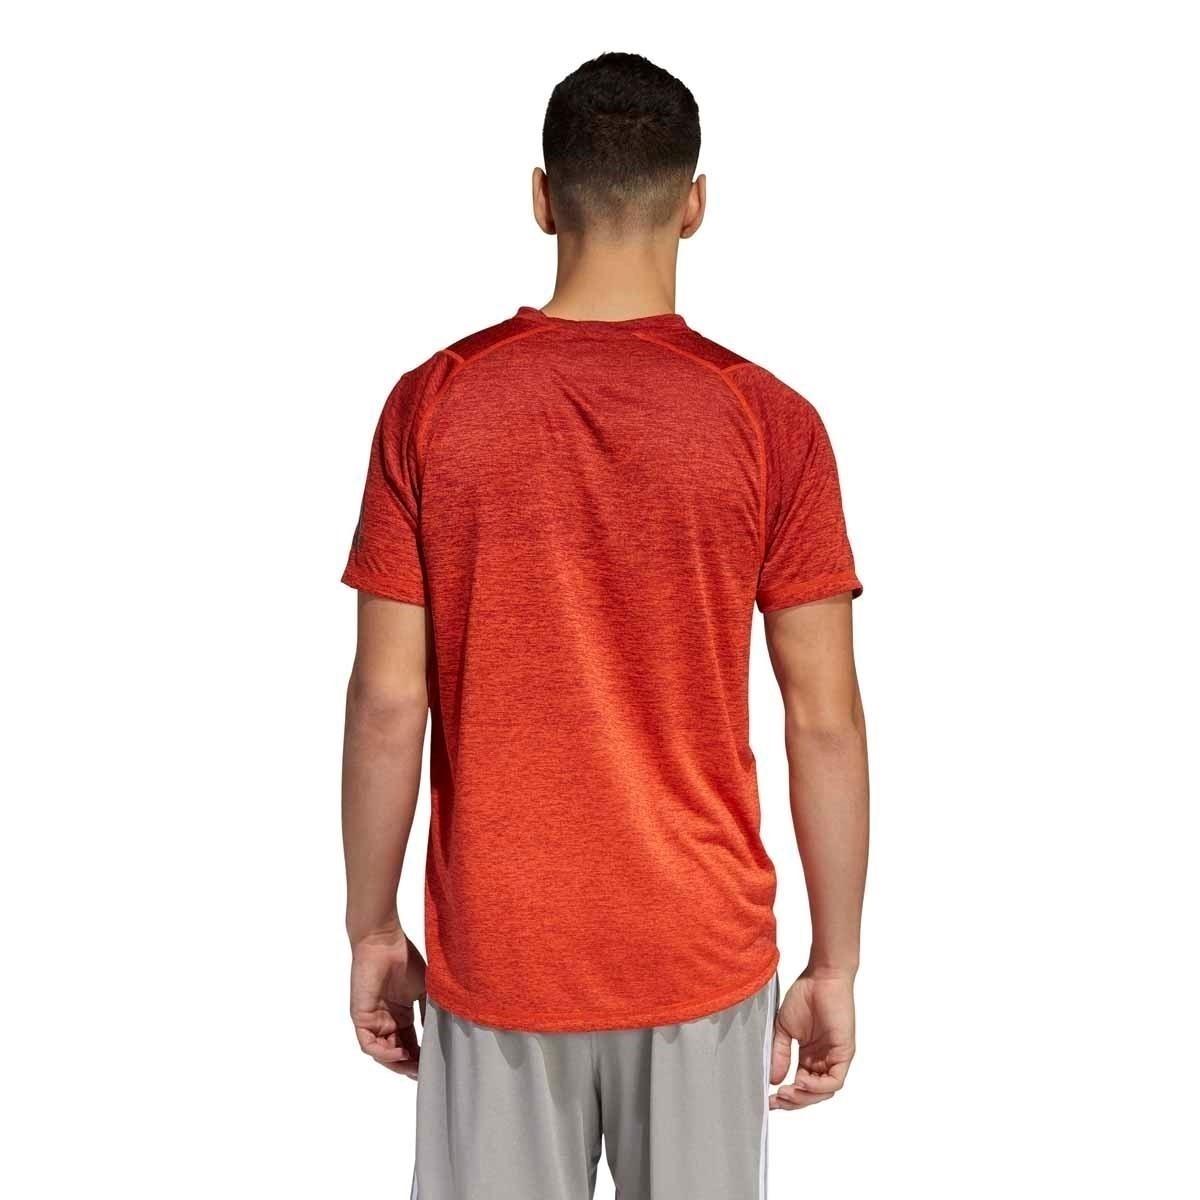 Adidas Freelift 360 Gradient Graphic T-Shirt Turuncu